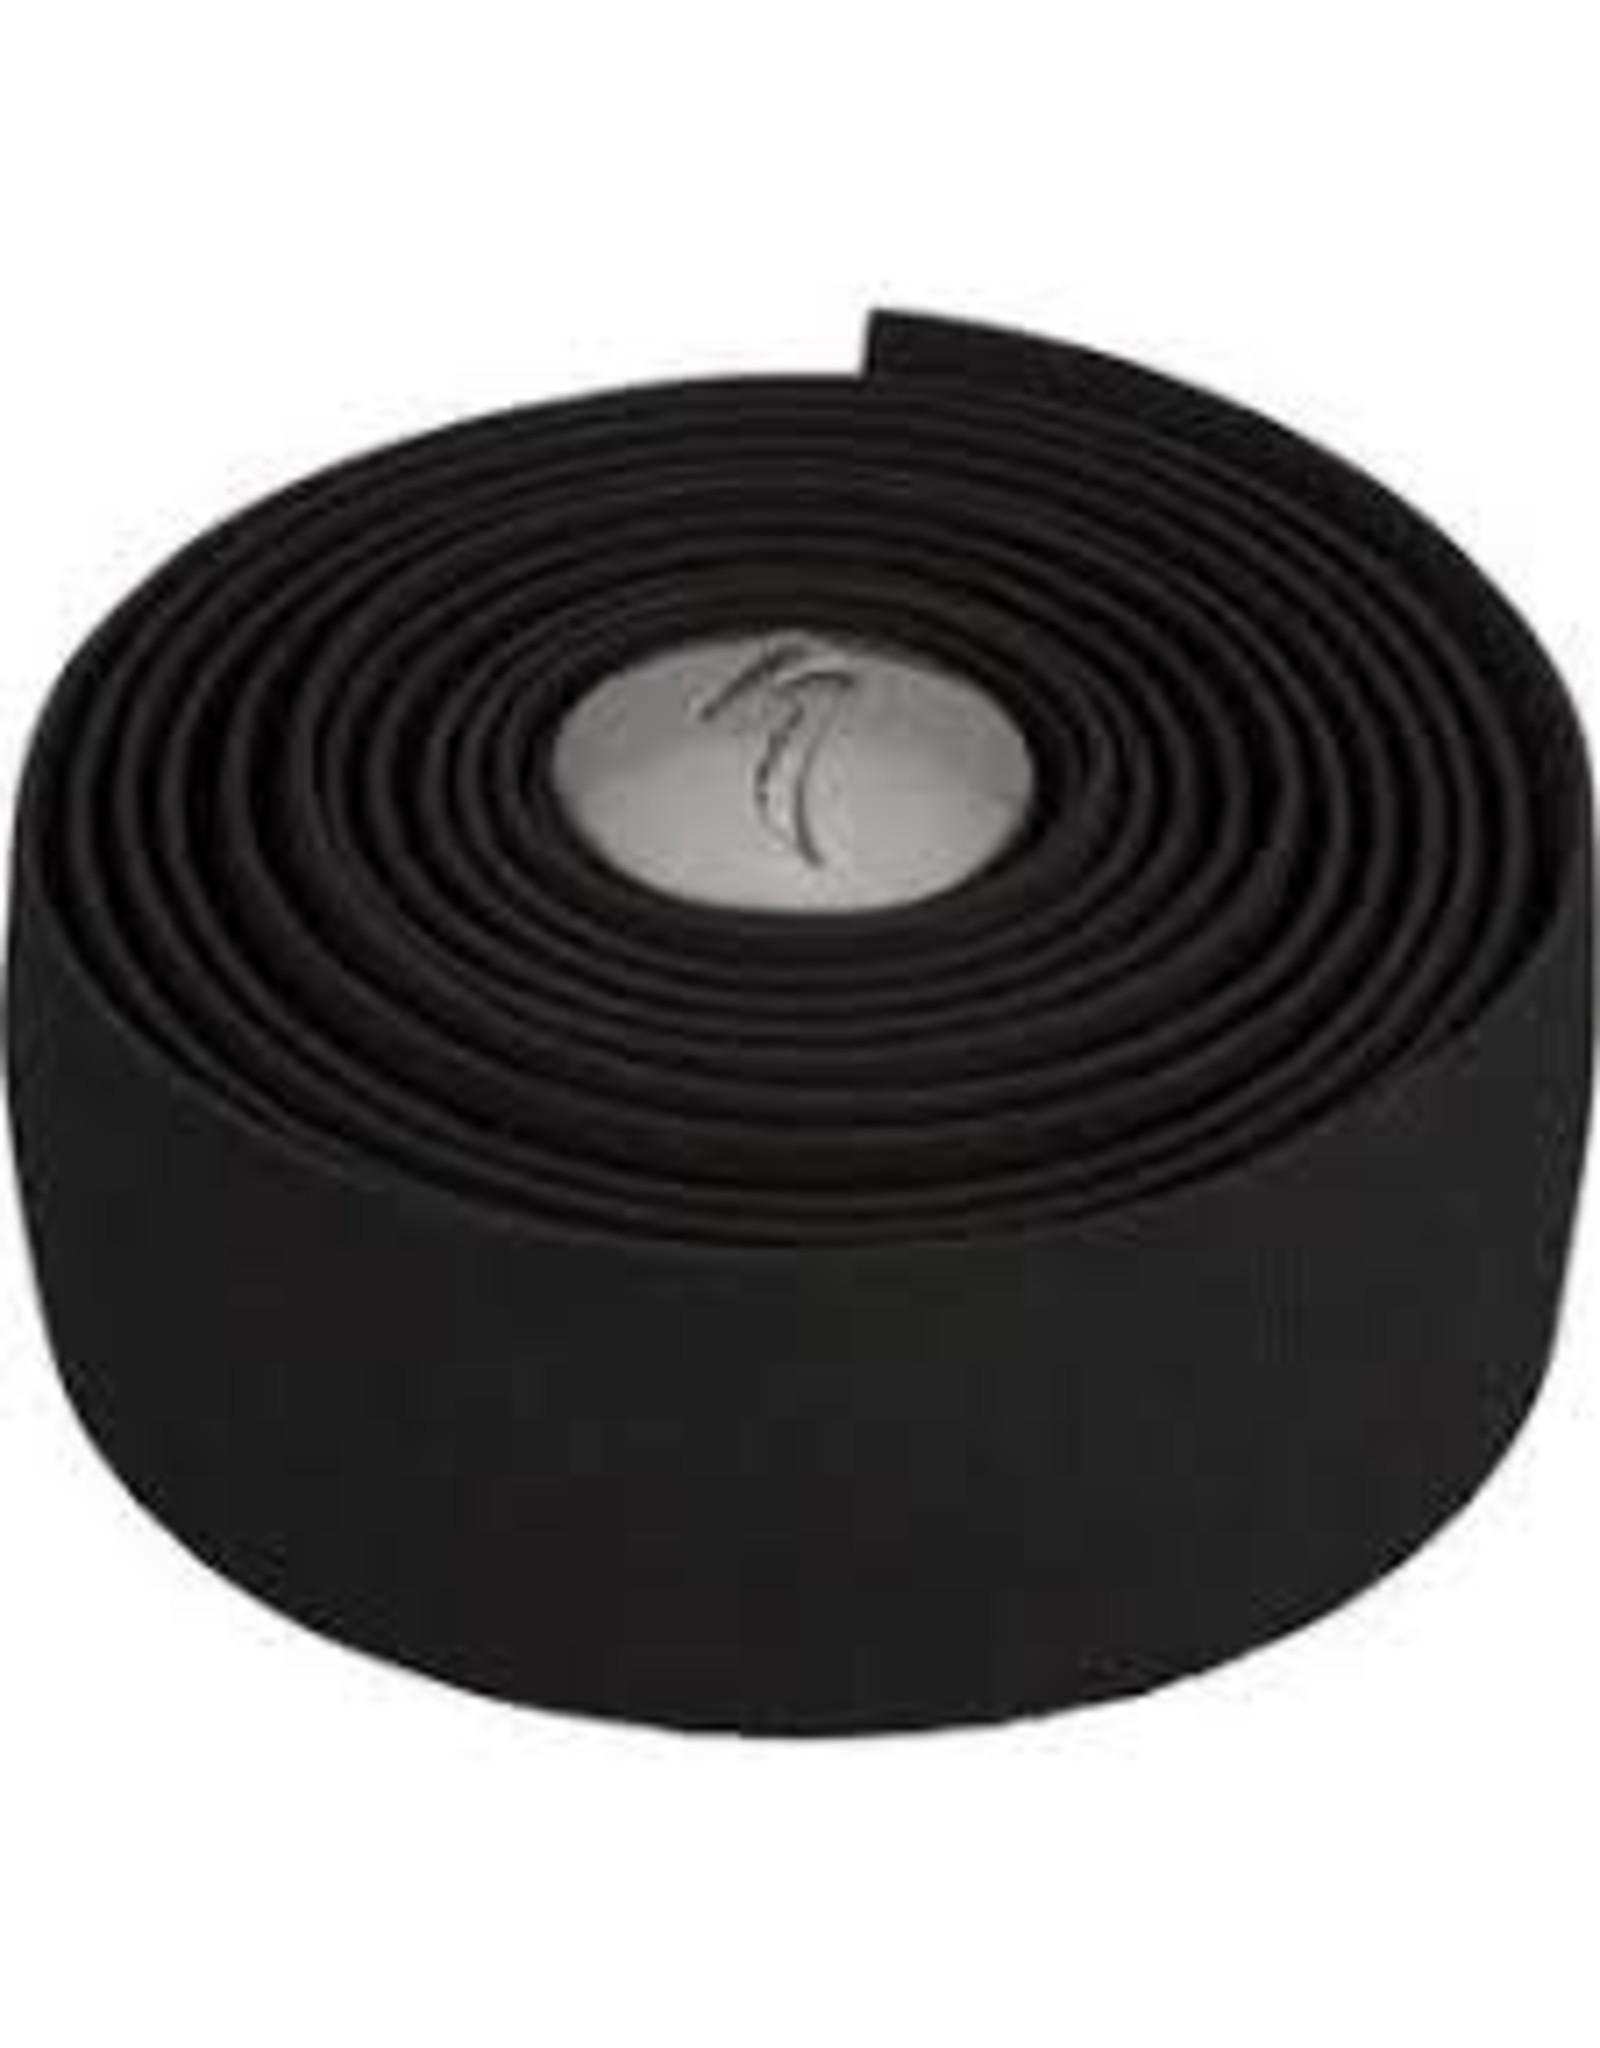 Specialized Bar Tape Spec BG Bar Phat 4.5mm Blk Tape